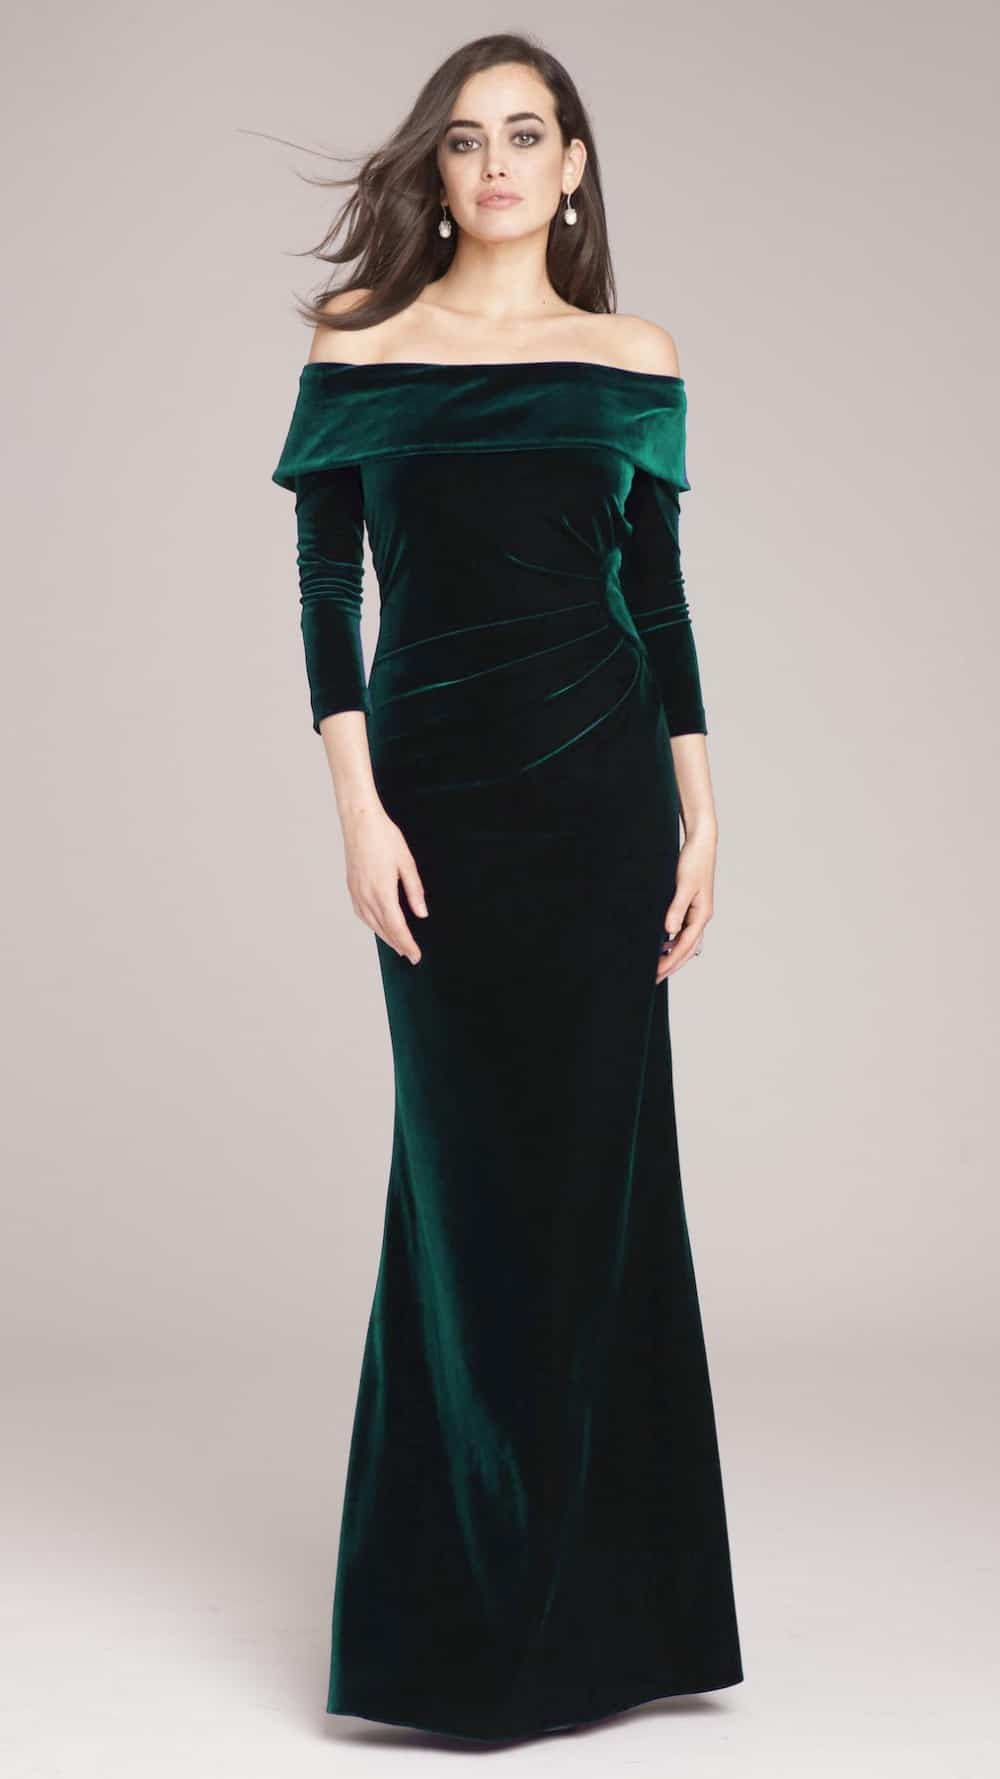 Off the Shoulder Emerald Green Velvet Gown | Dress for the Wedding